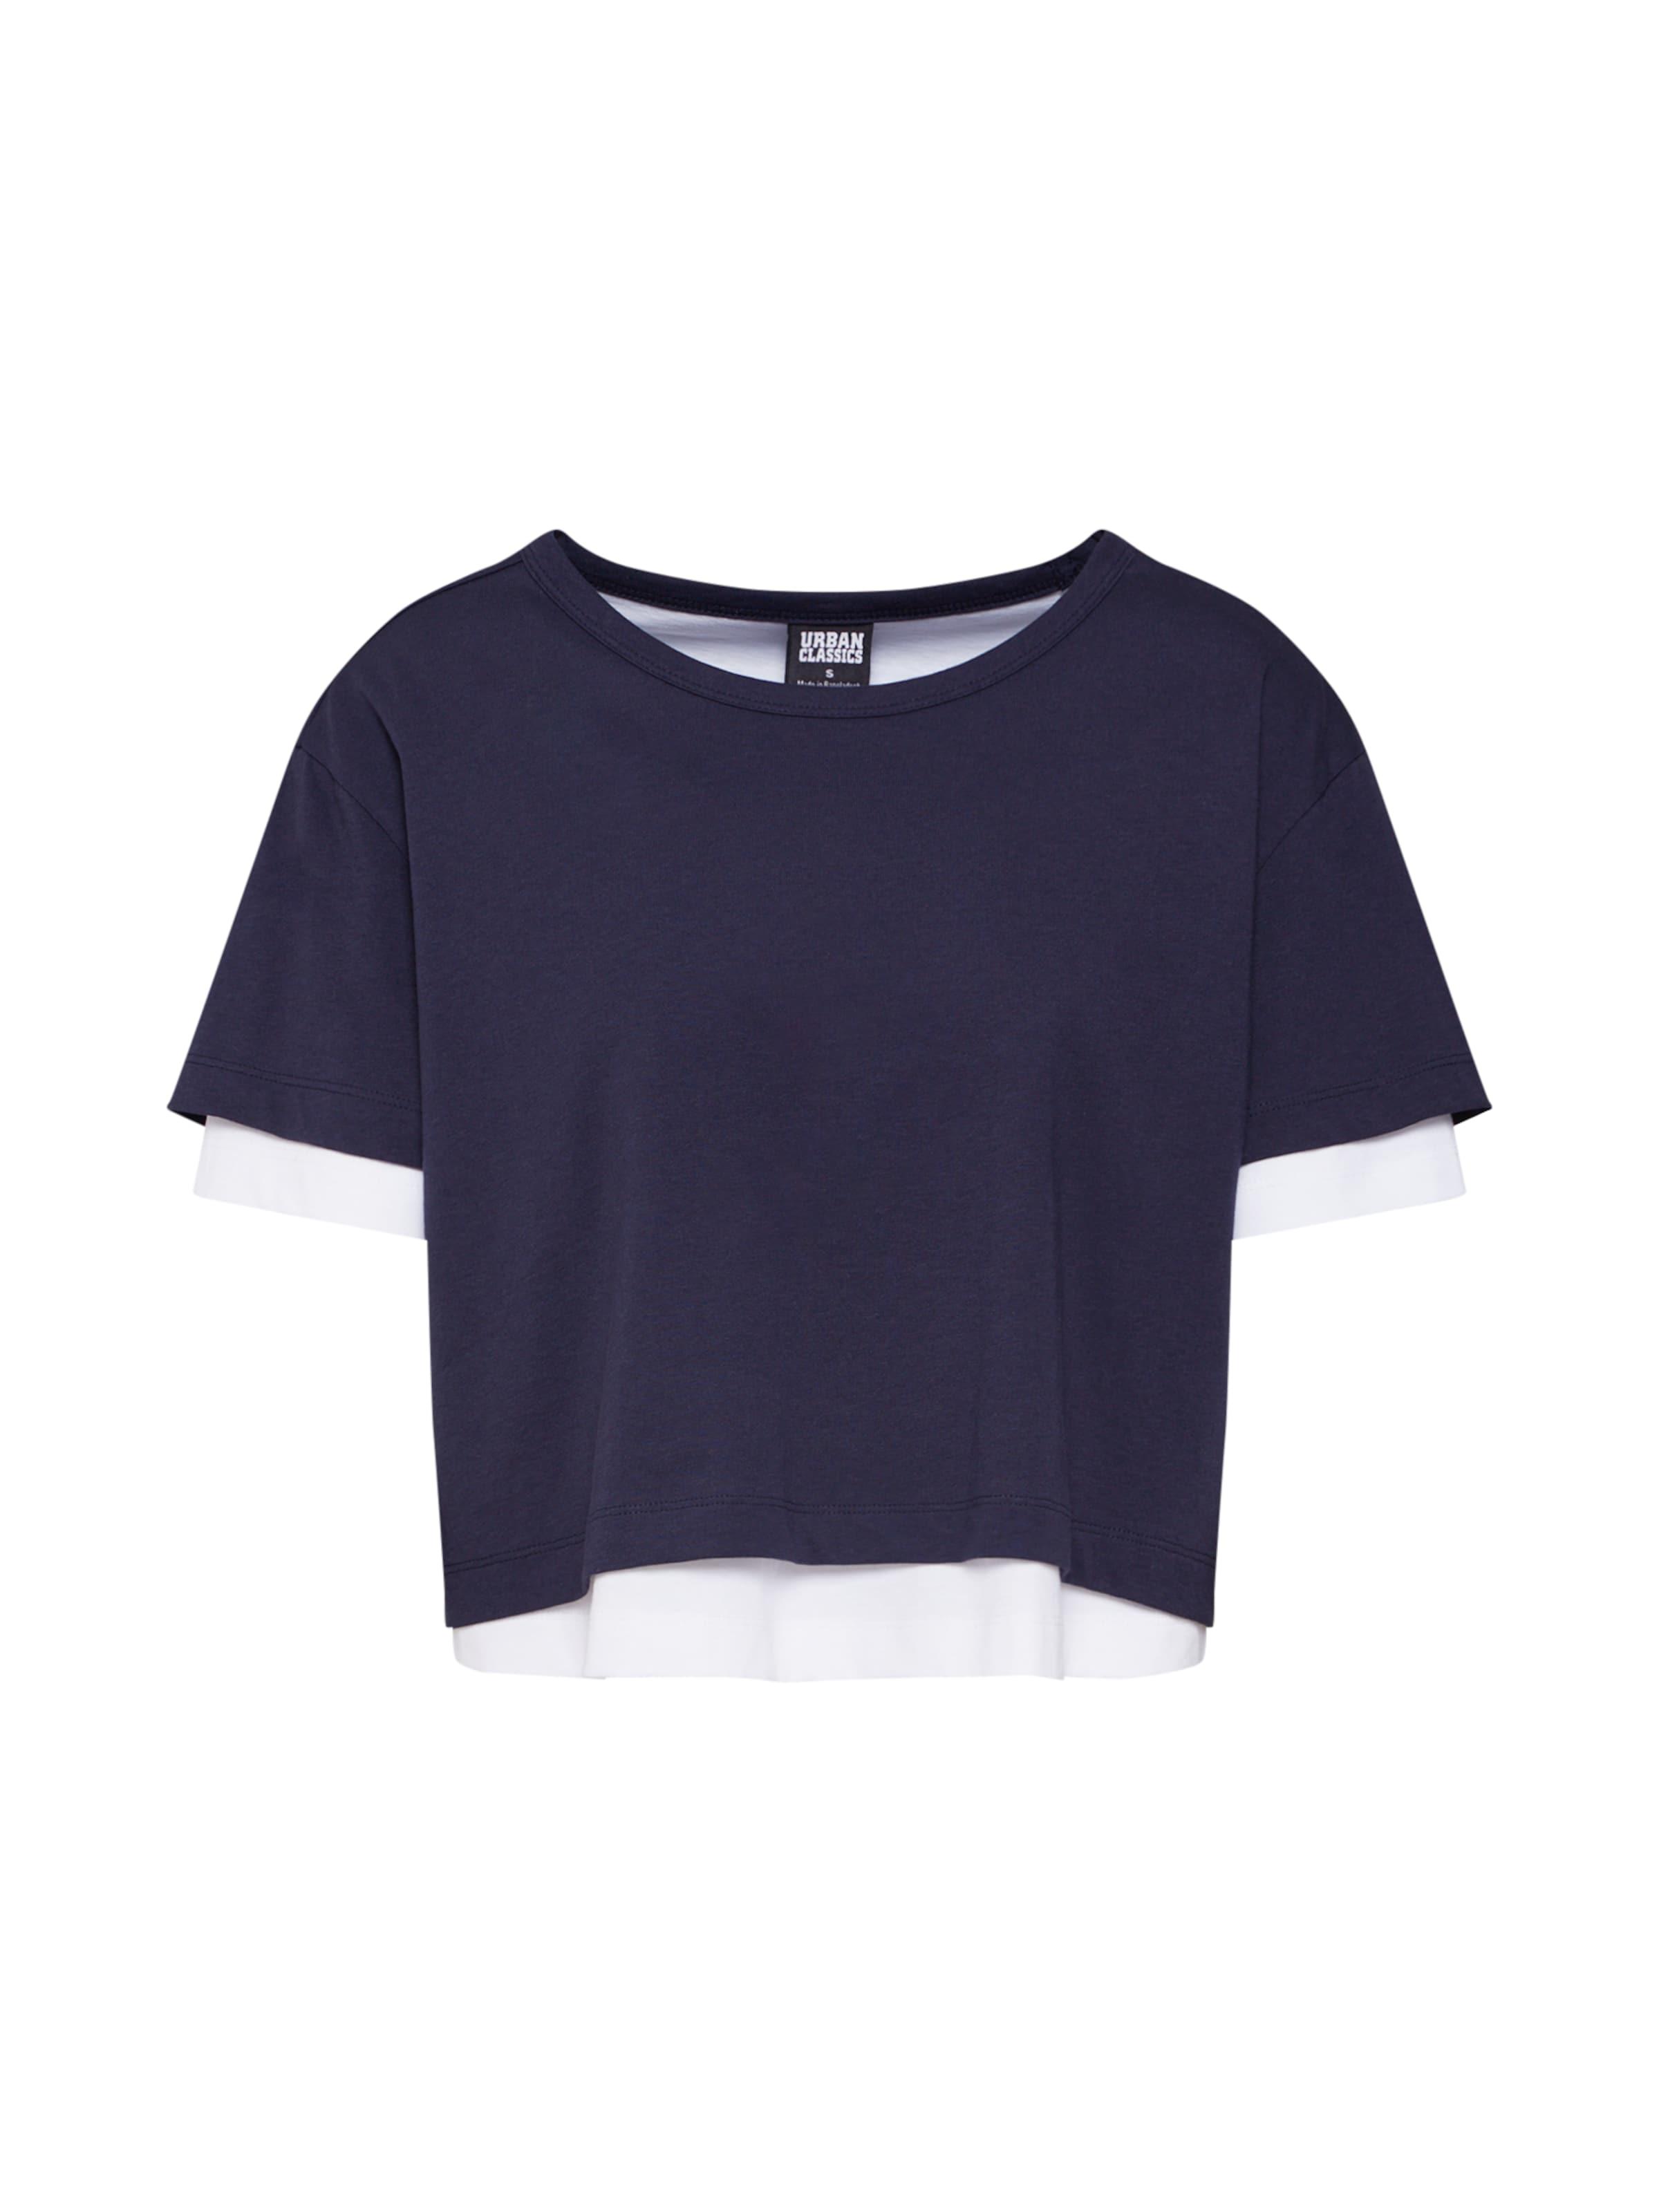 Weiß Urban Classics Shirt In BlauDunkelblau SzMpUV